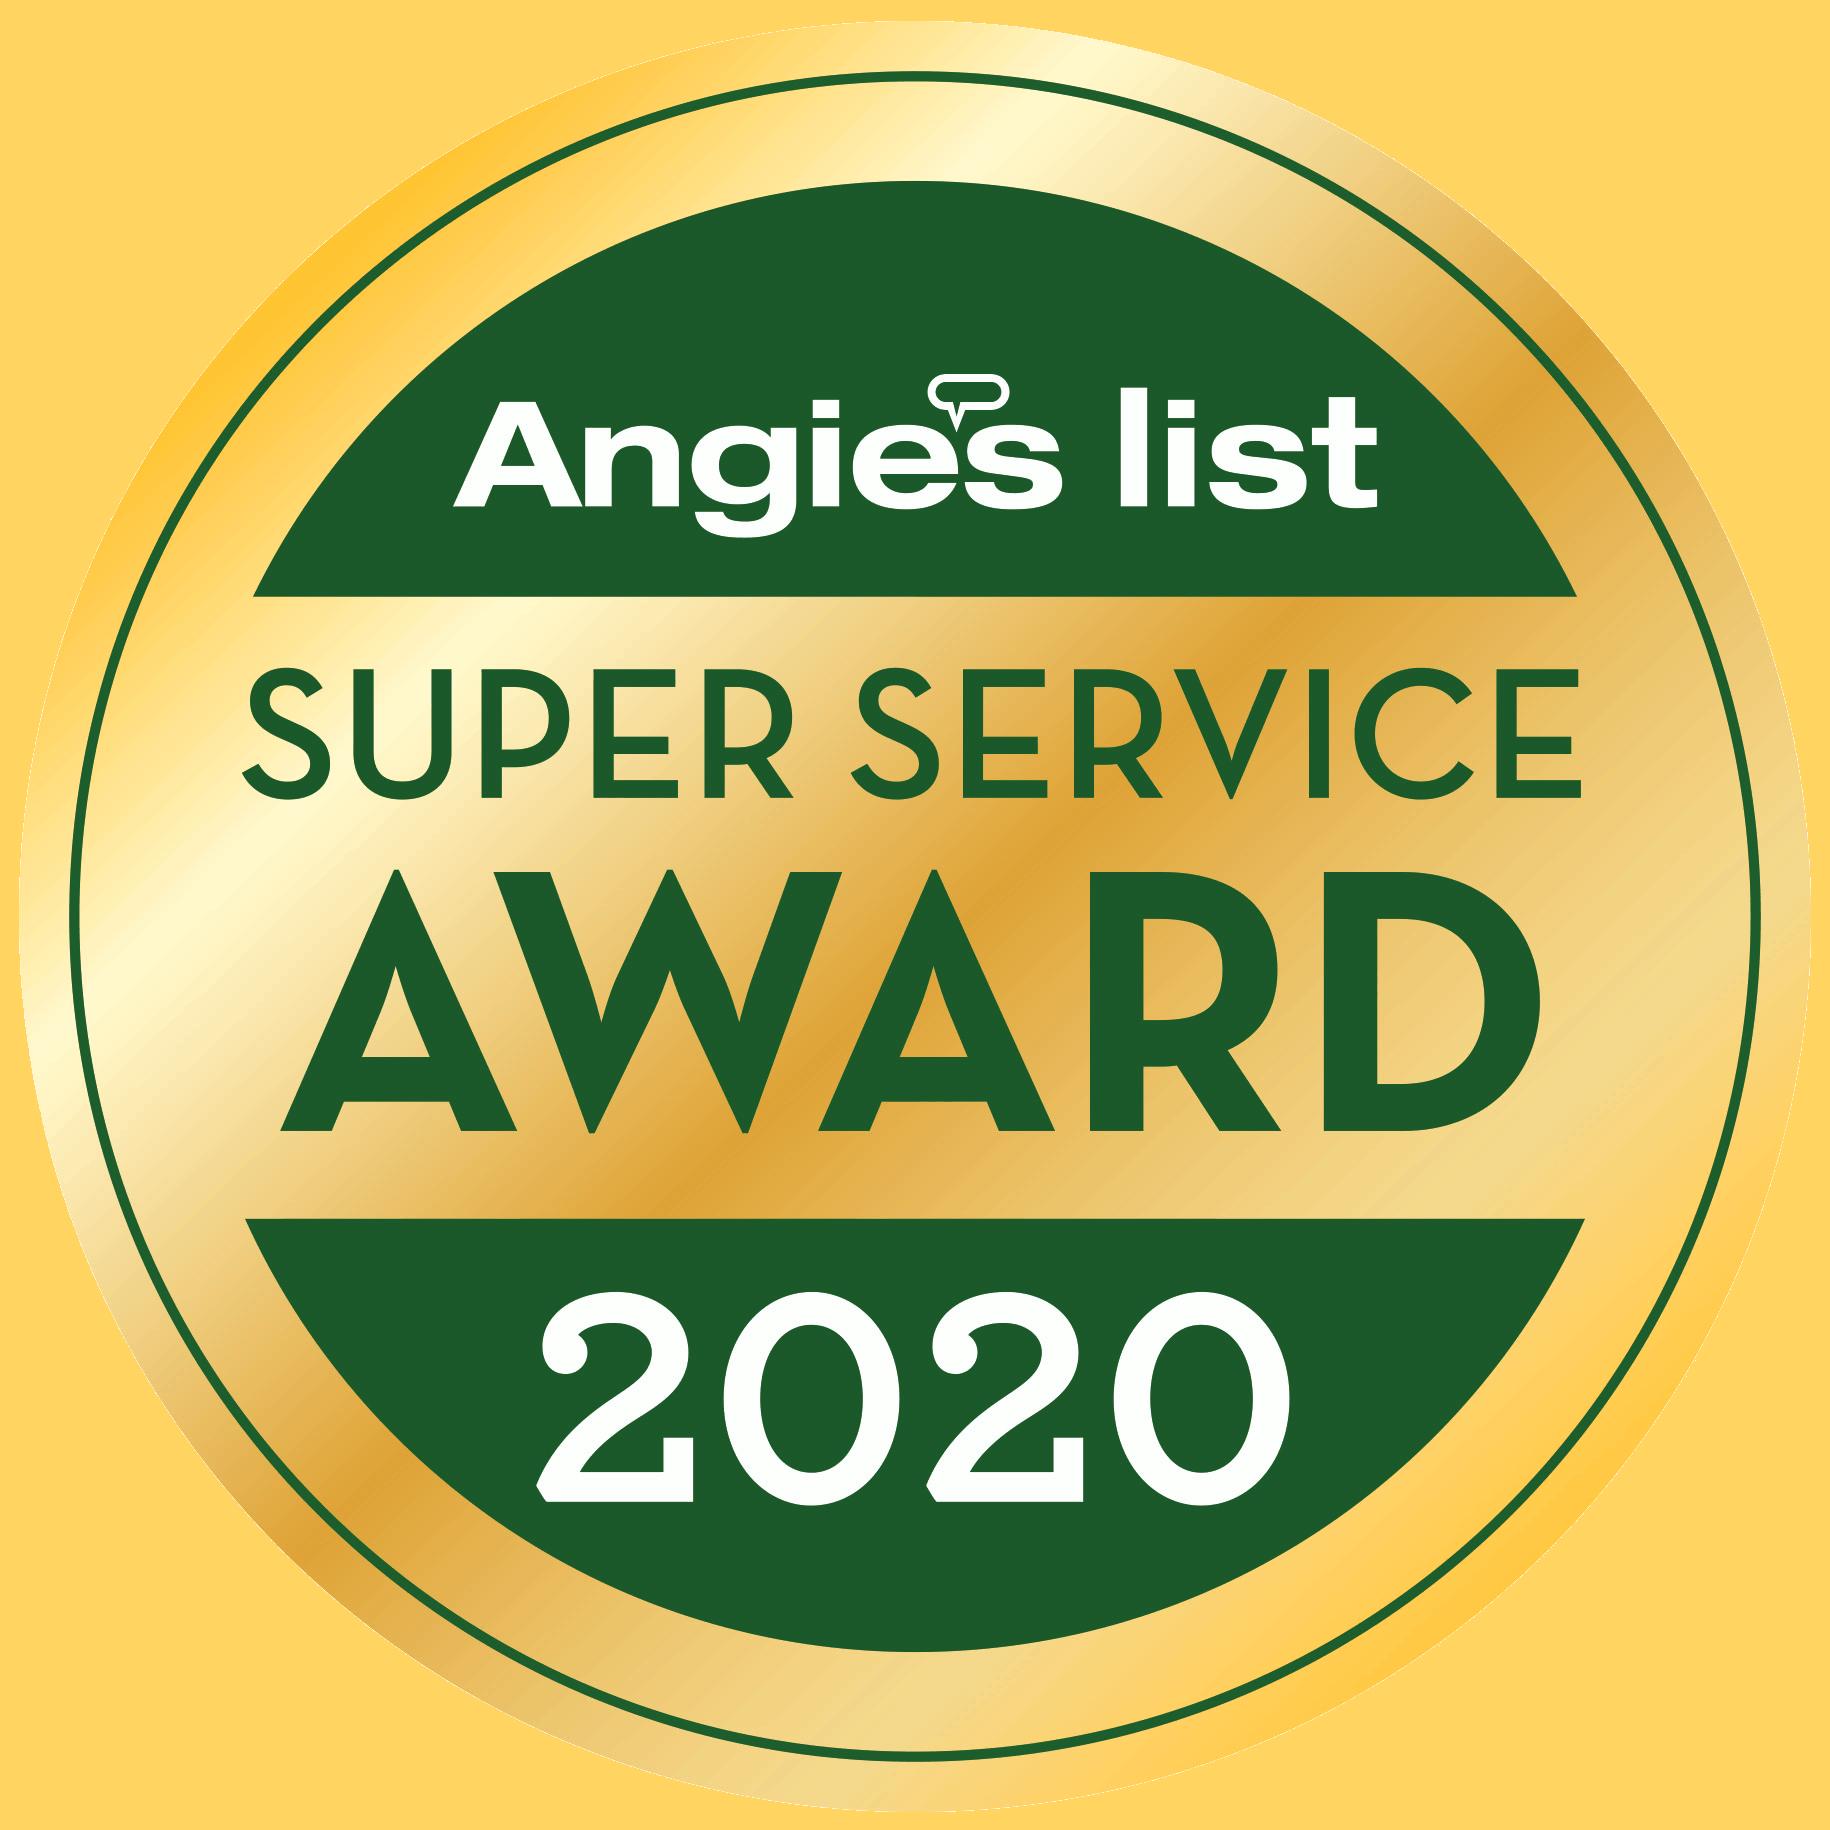 Angie's List 2020 Super Service Award Badge